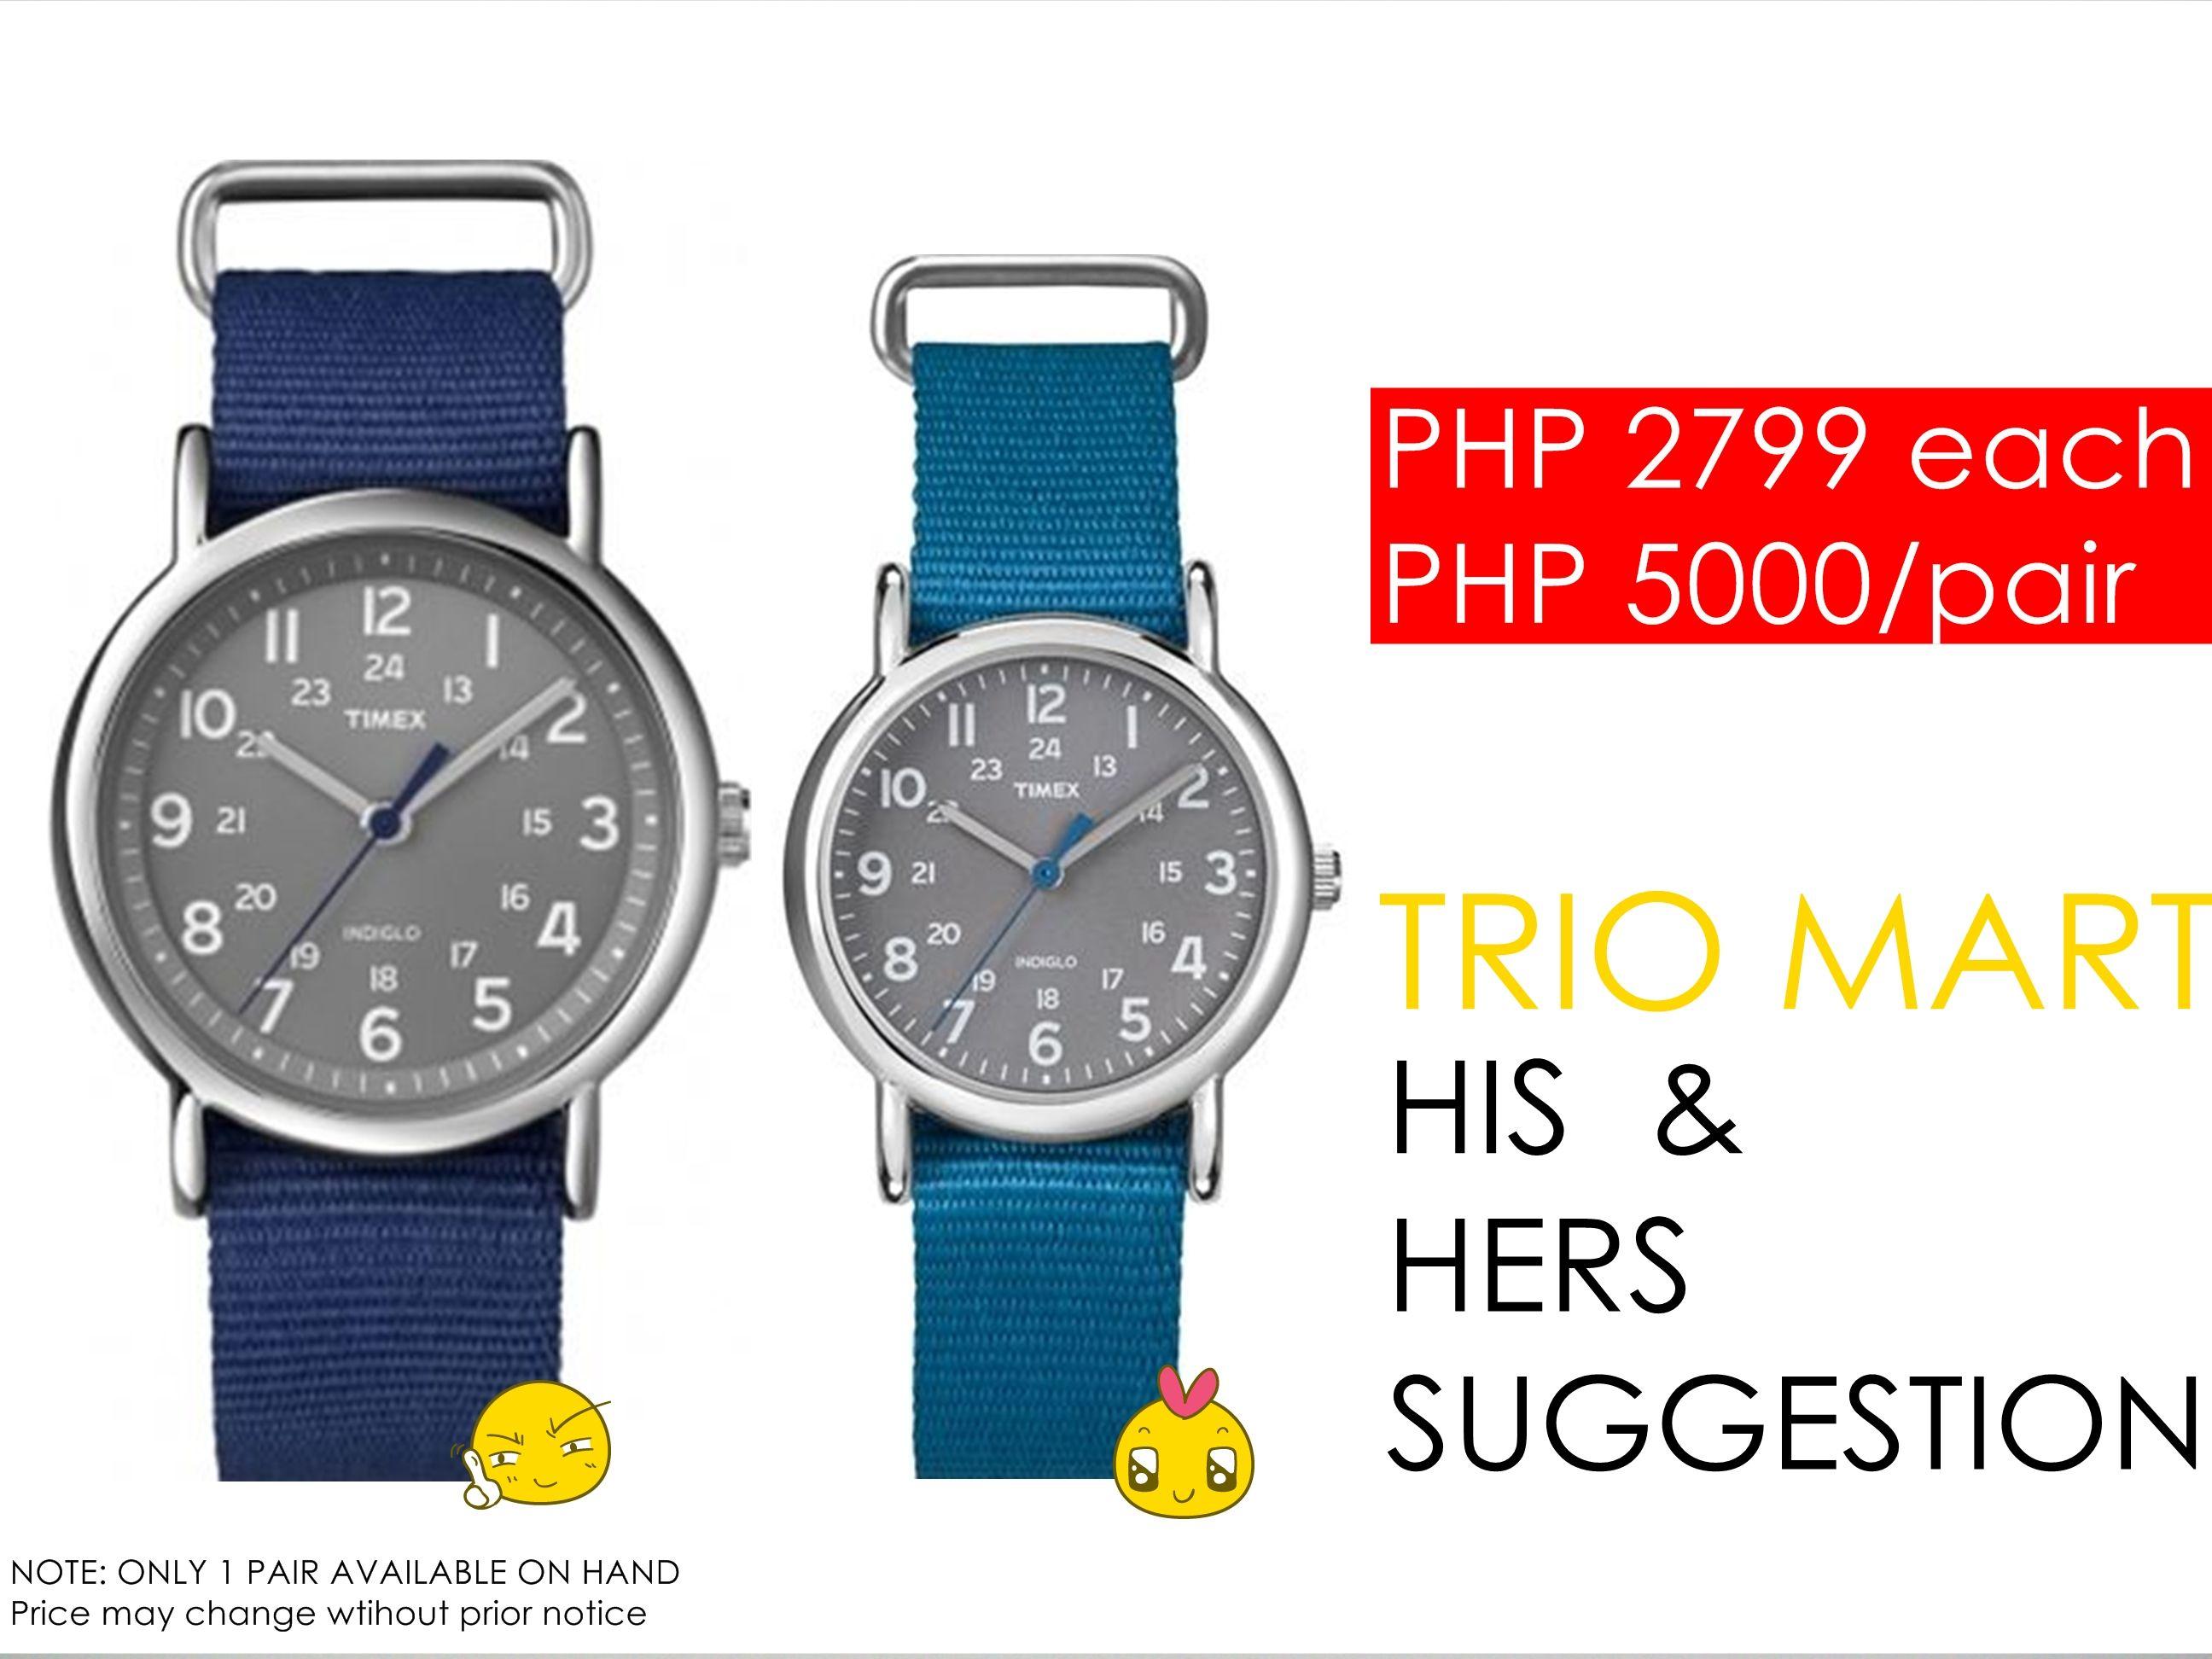 b41919a7d09 Timex Couple Watch Suggestion Men s and Women s Weekender Watch Timex  Women s Weekender T2N913 Blue Nylon Quartz